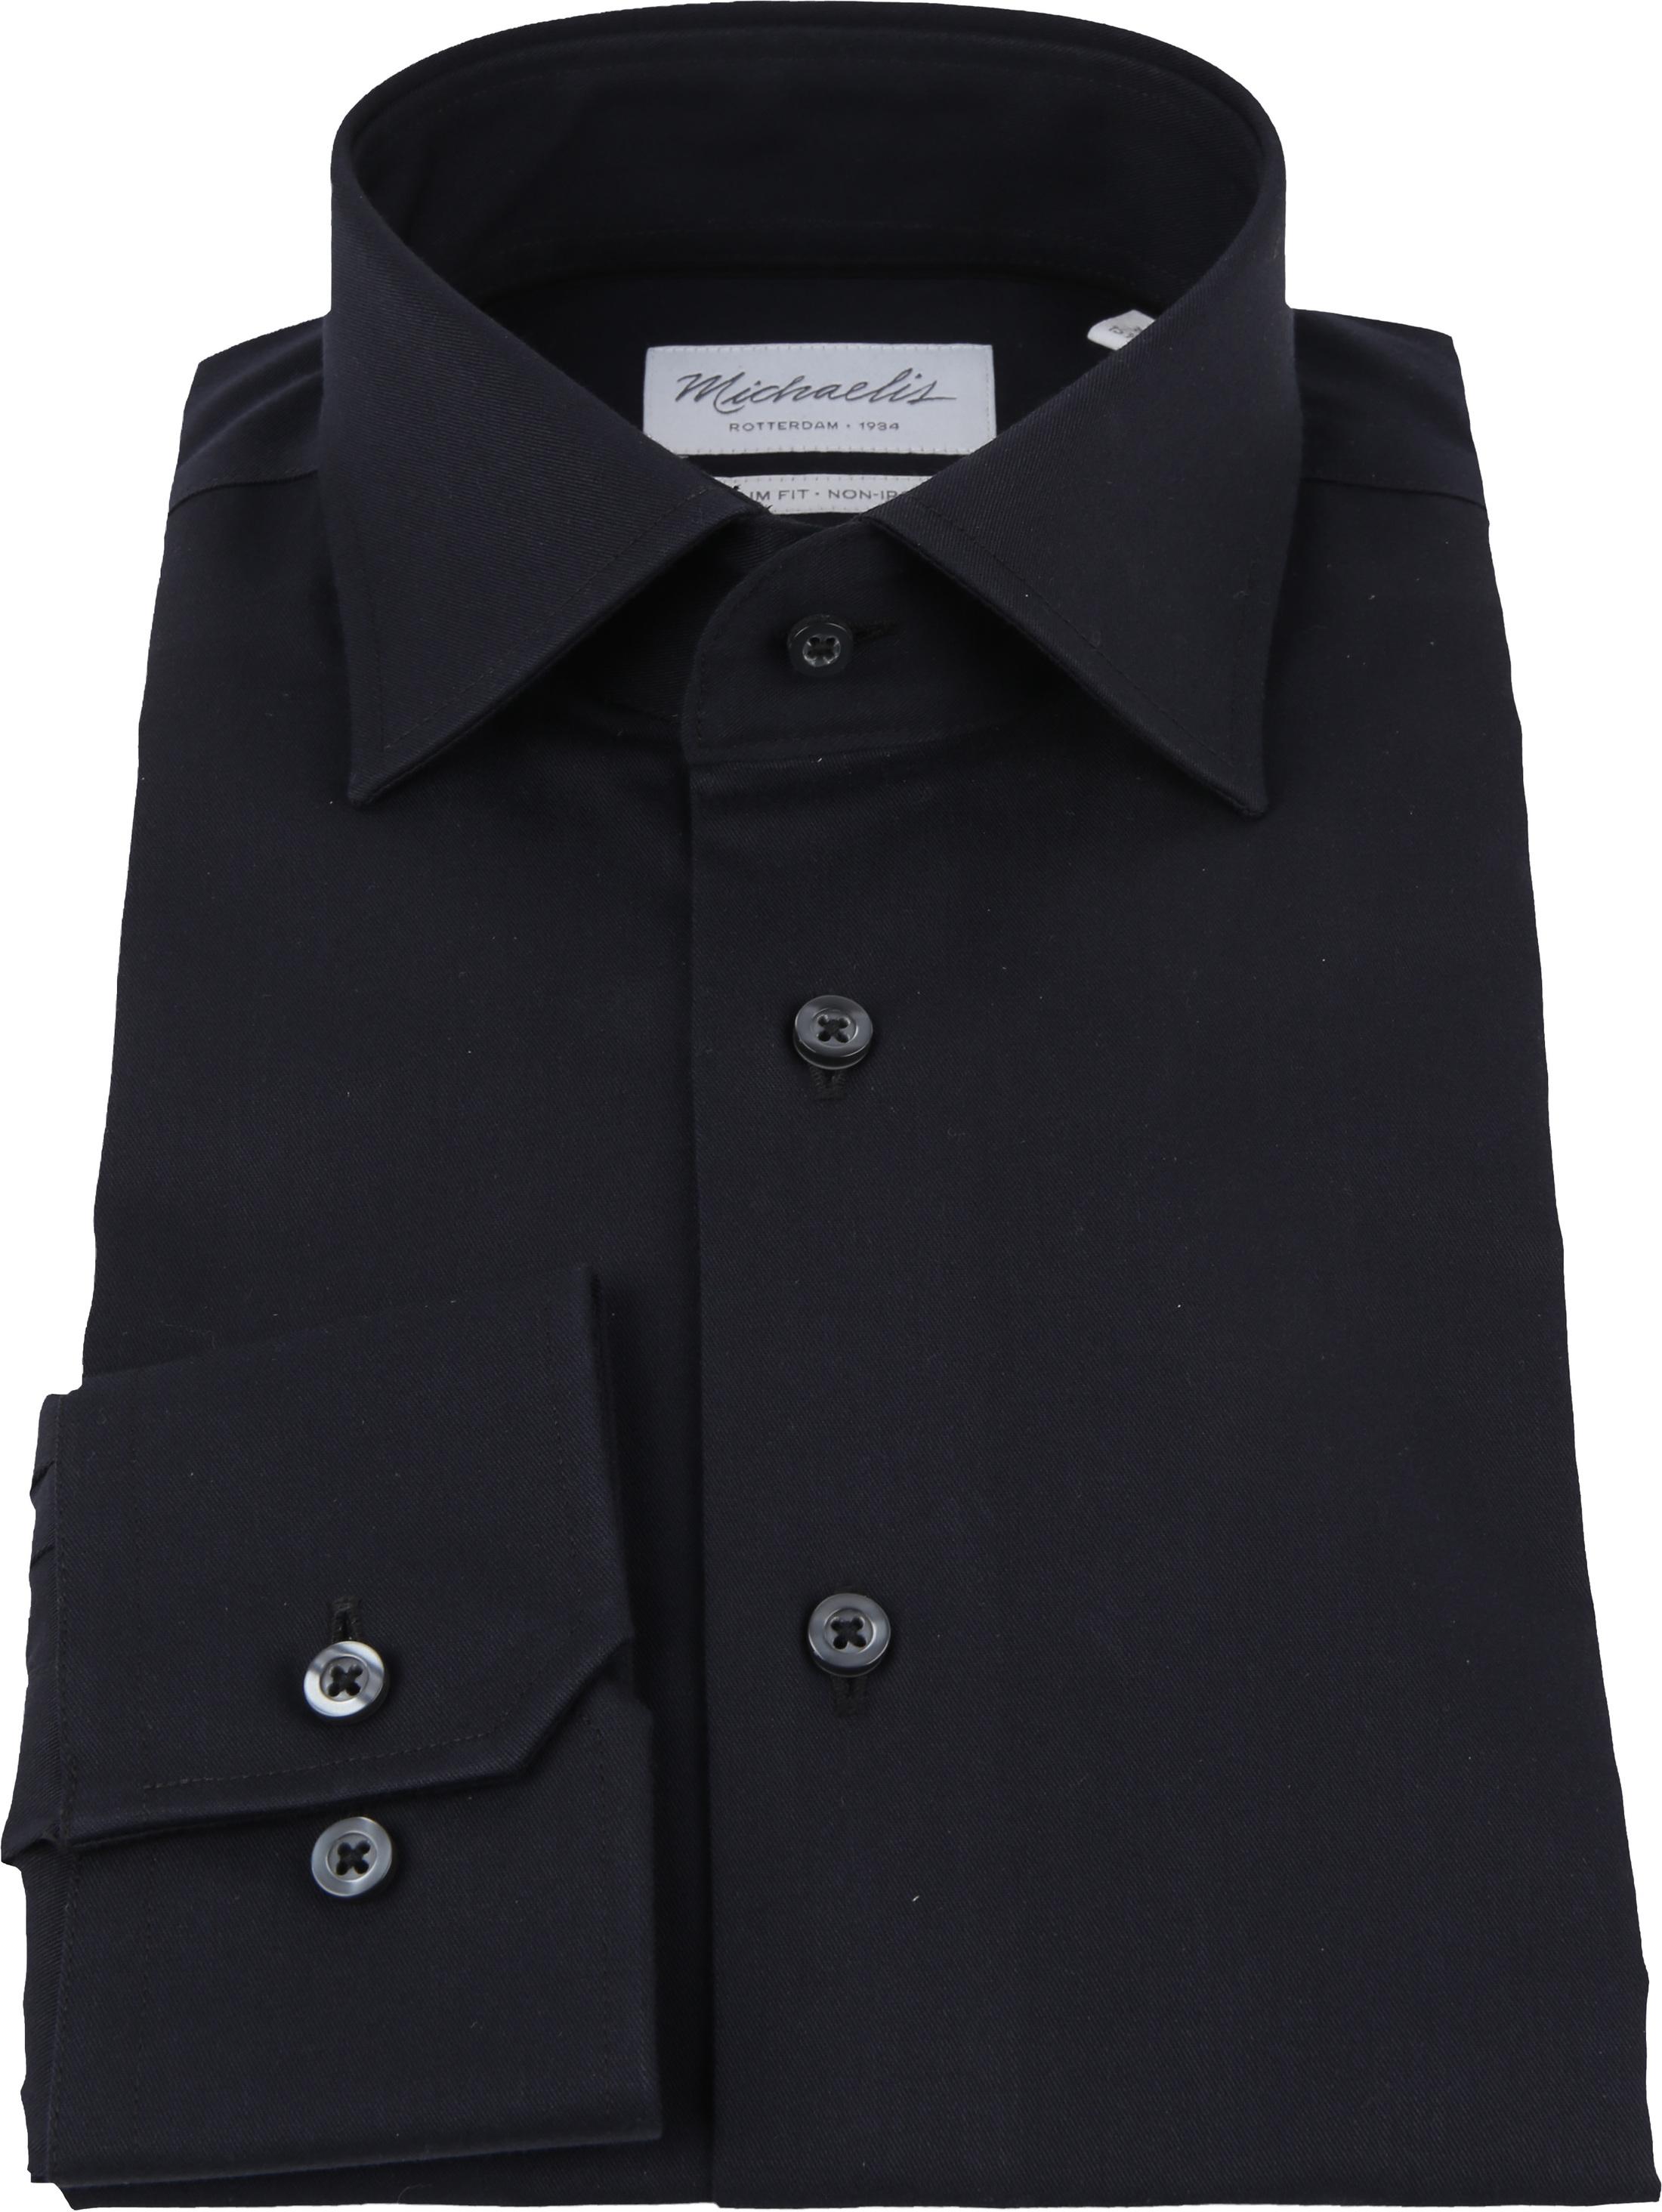 Michaelis Overhemd Slim Fit Zwart foto 3